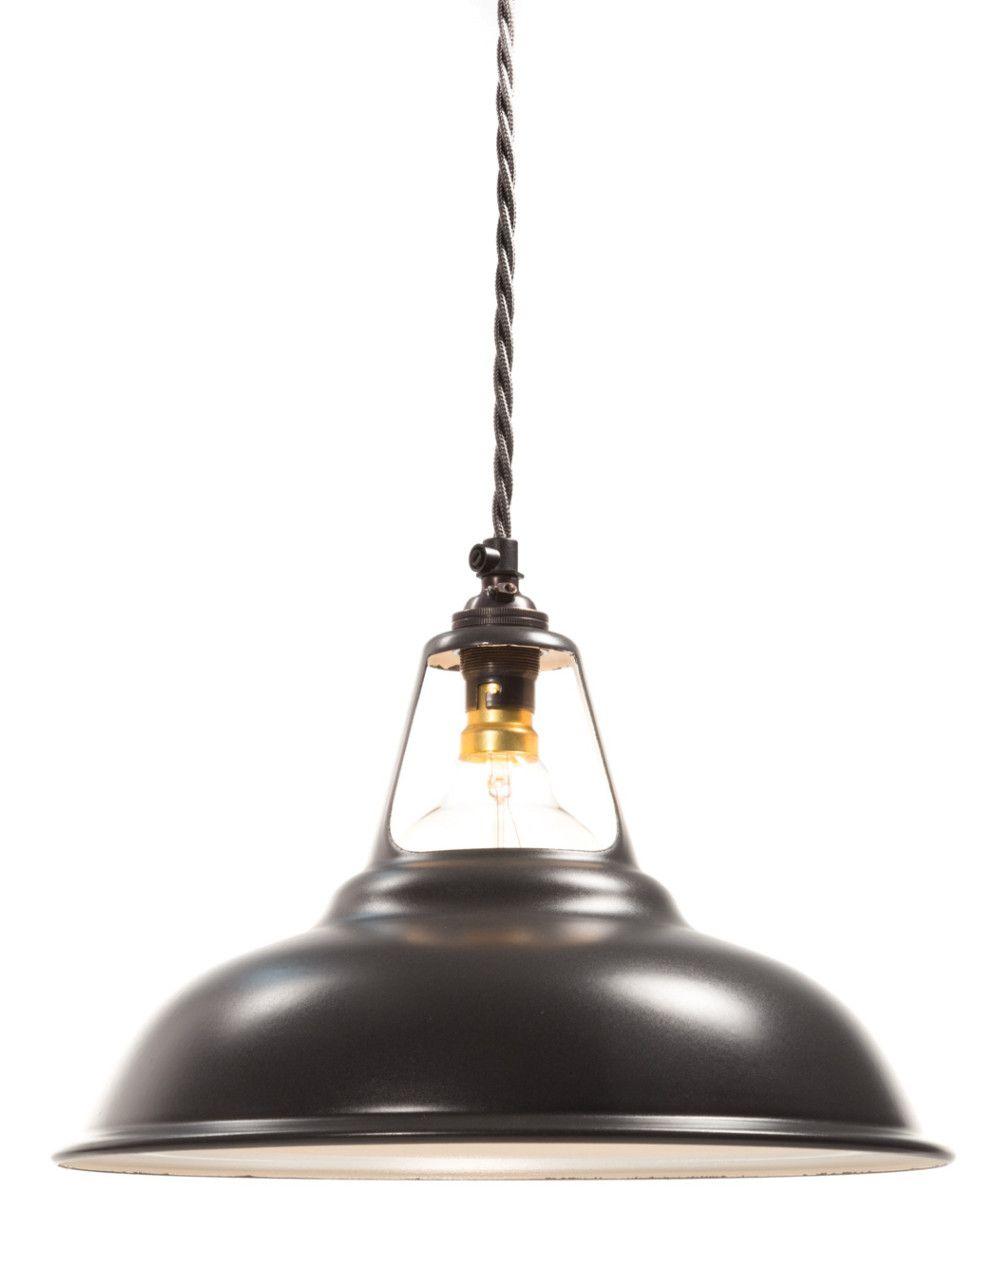 Matt Black Enamel Coolicon Lamp Shade 280mm B22 Ceiling